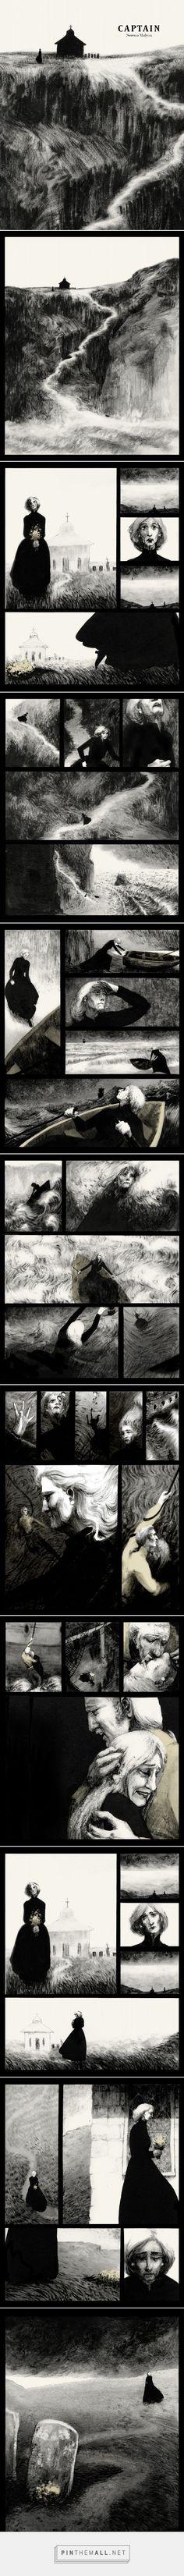 Captain - Graphic Novel - Serena Malyon Illustration - created via https://pinthemall.net